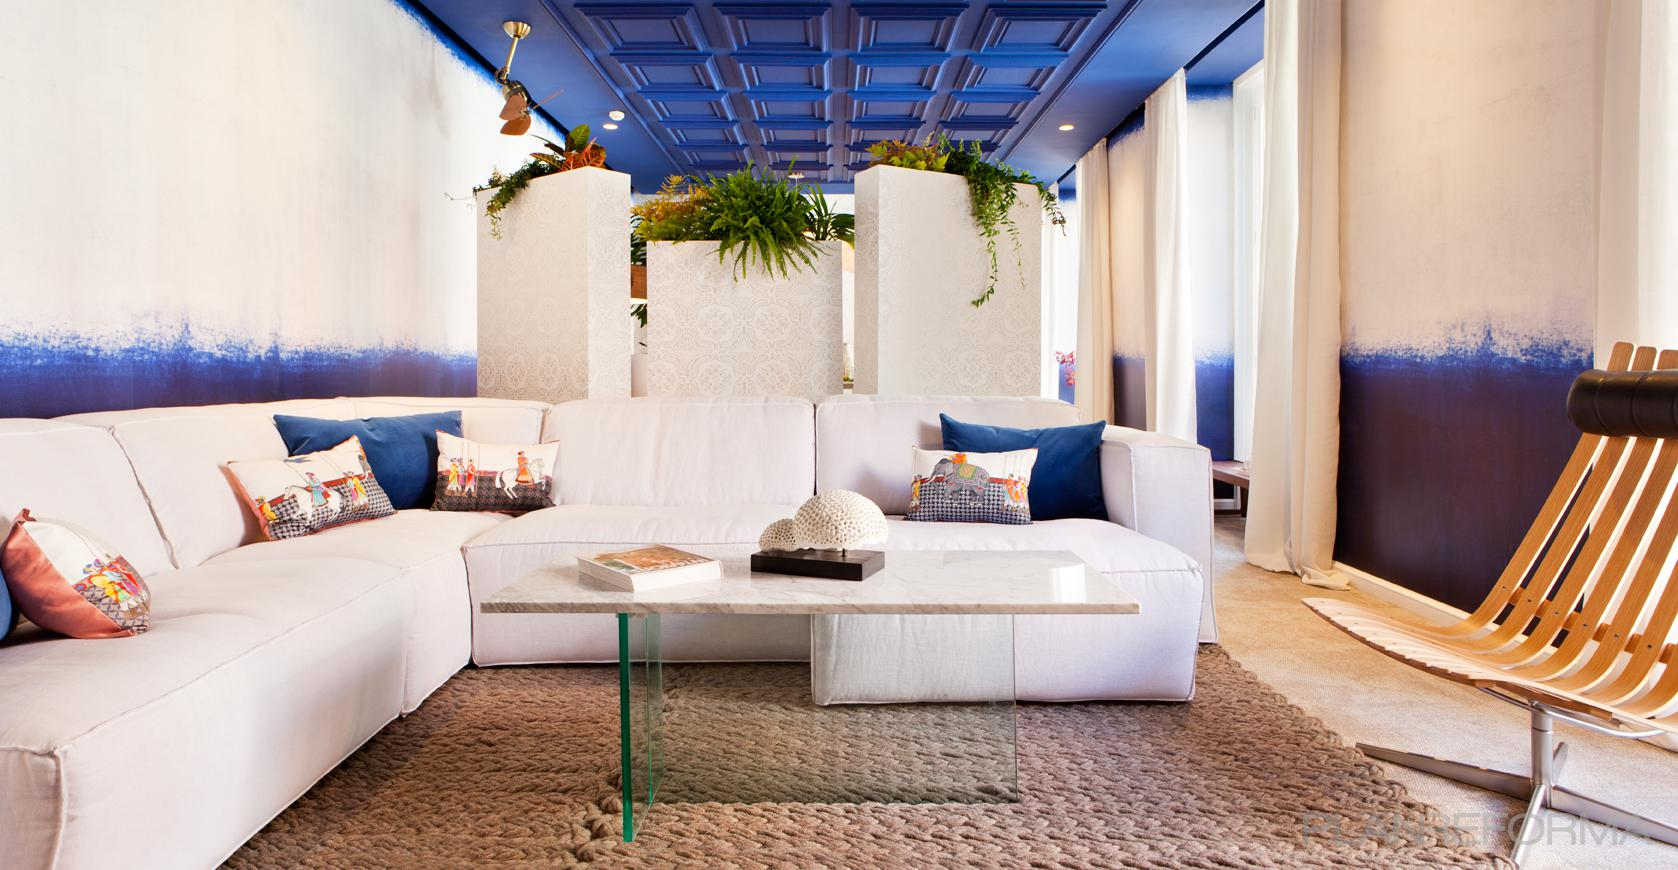 Salon estilo mediterraneo azul azul oscuro blanco - Forma interiorismo ...